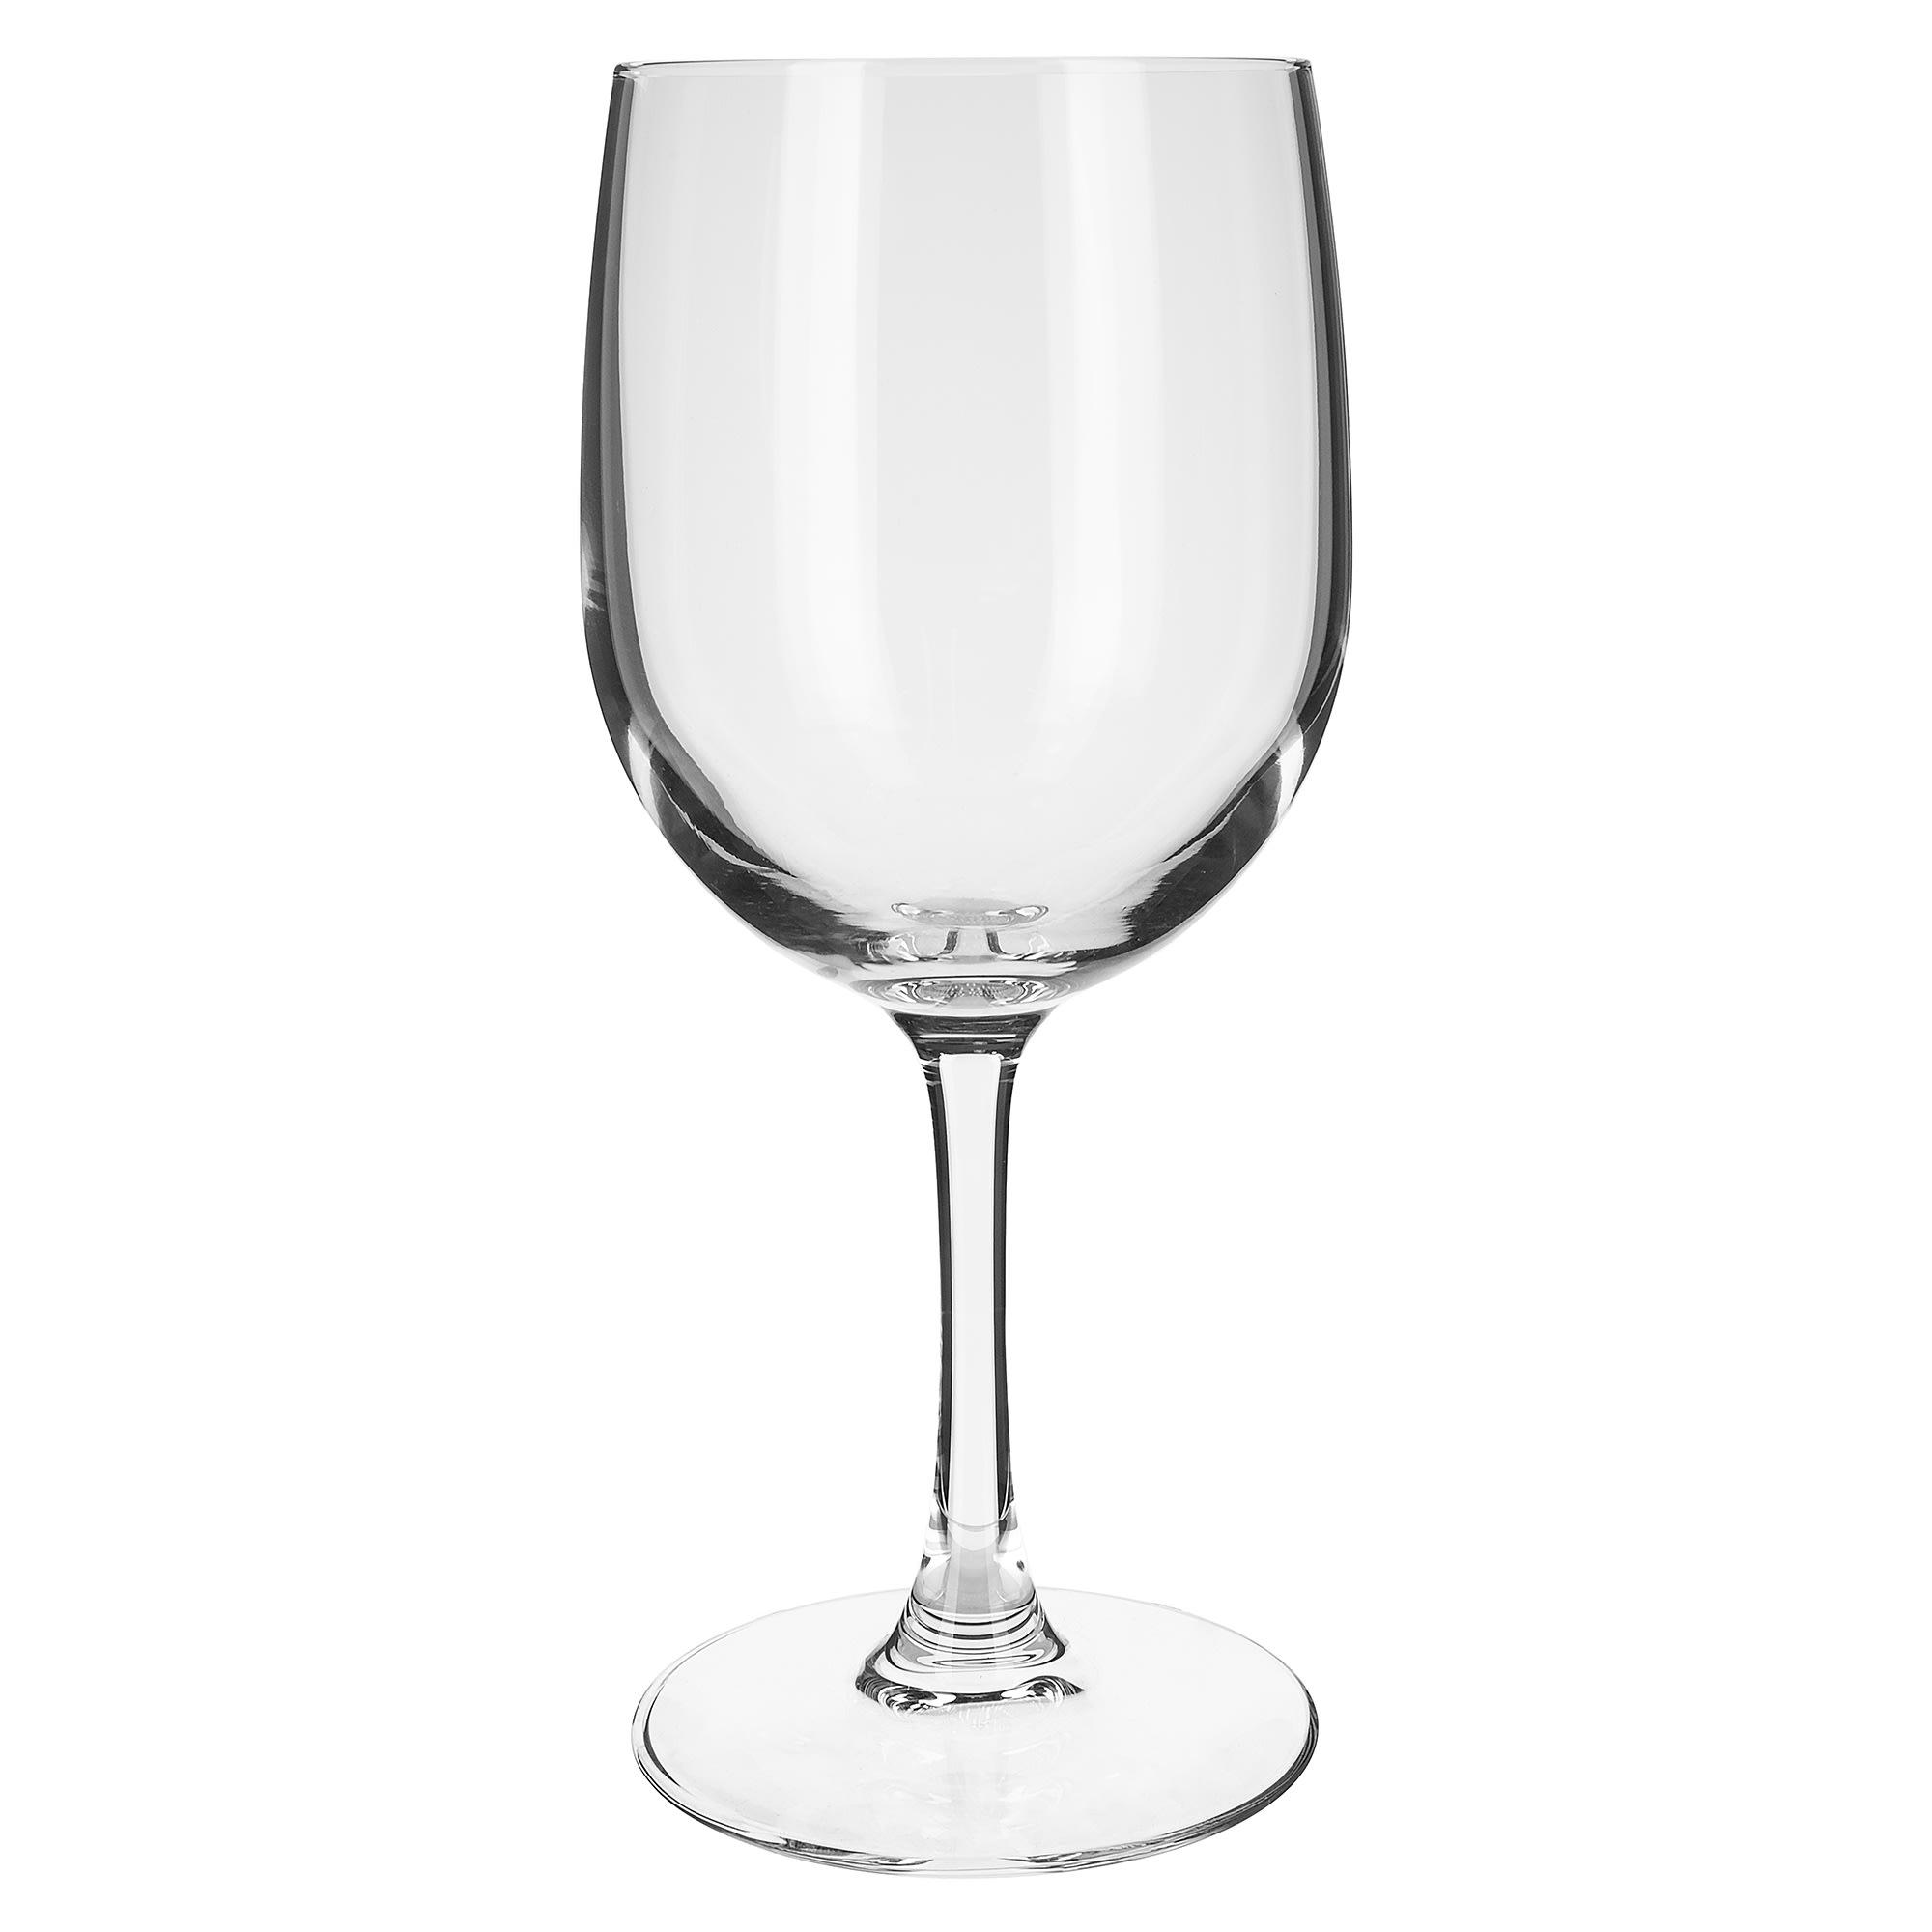 Libbey 8573SR 13-oz Bristol Valley White Wine Glass - Sheer Rim